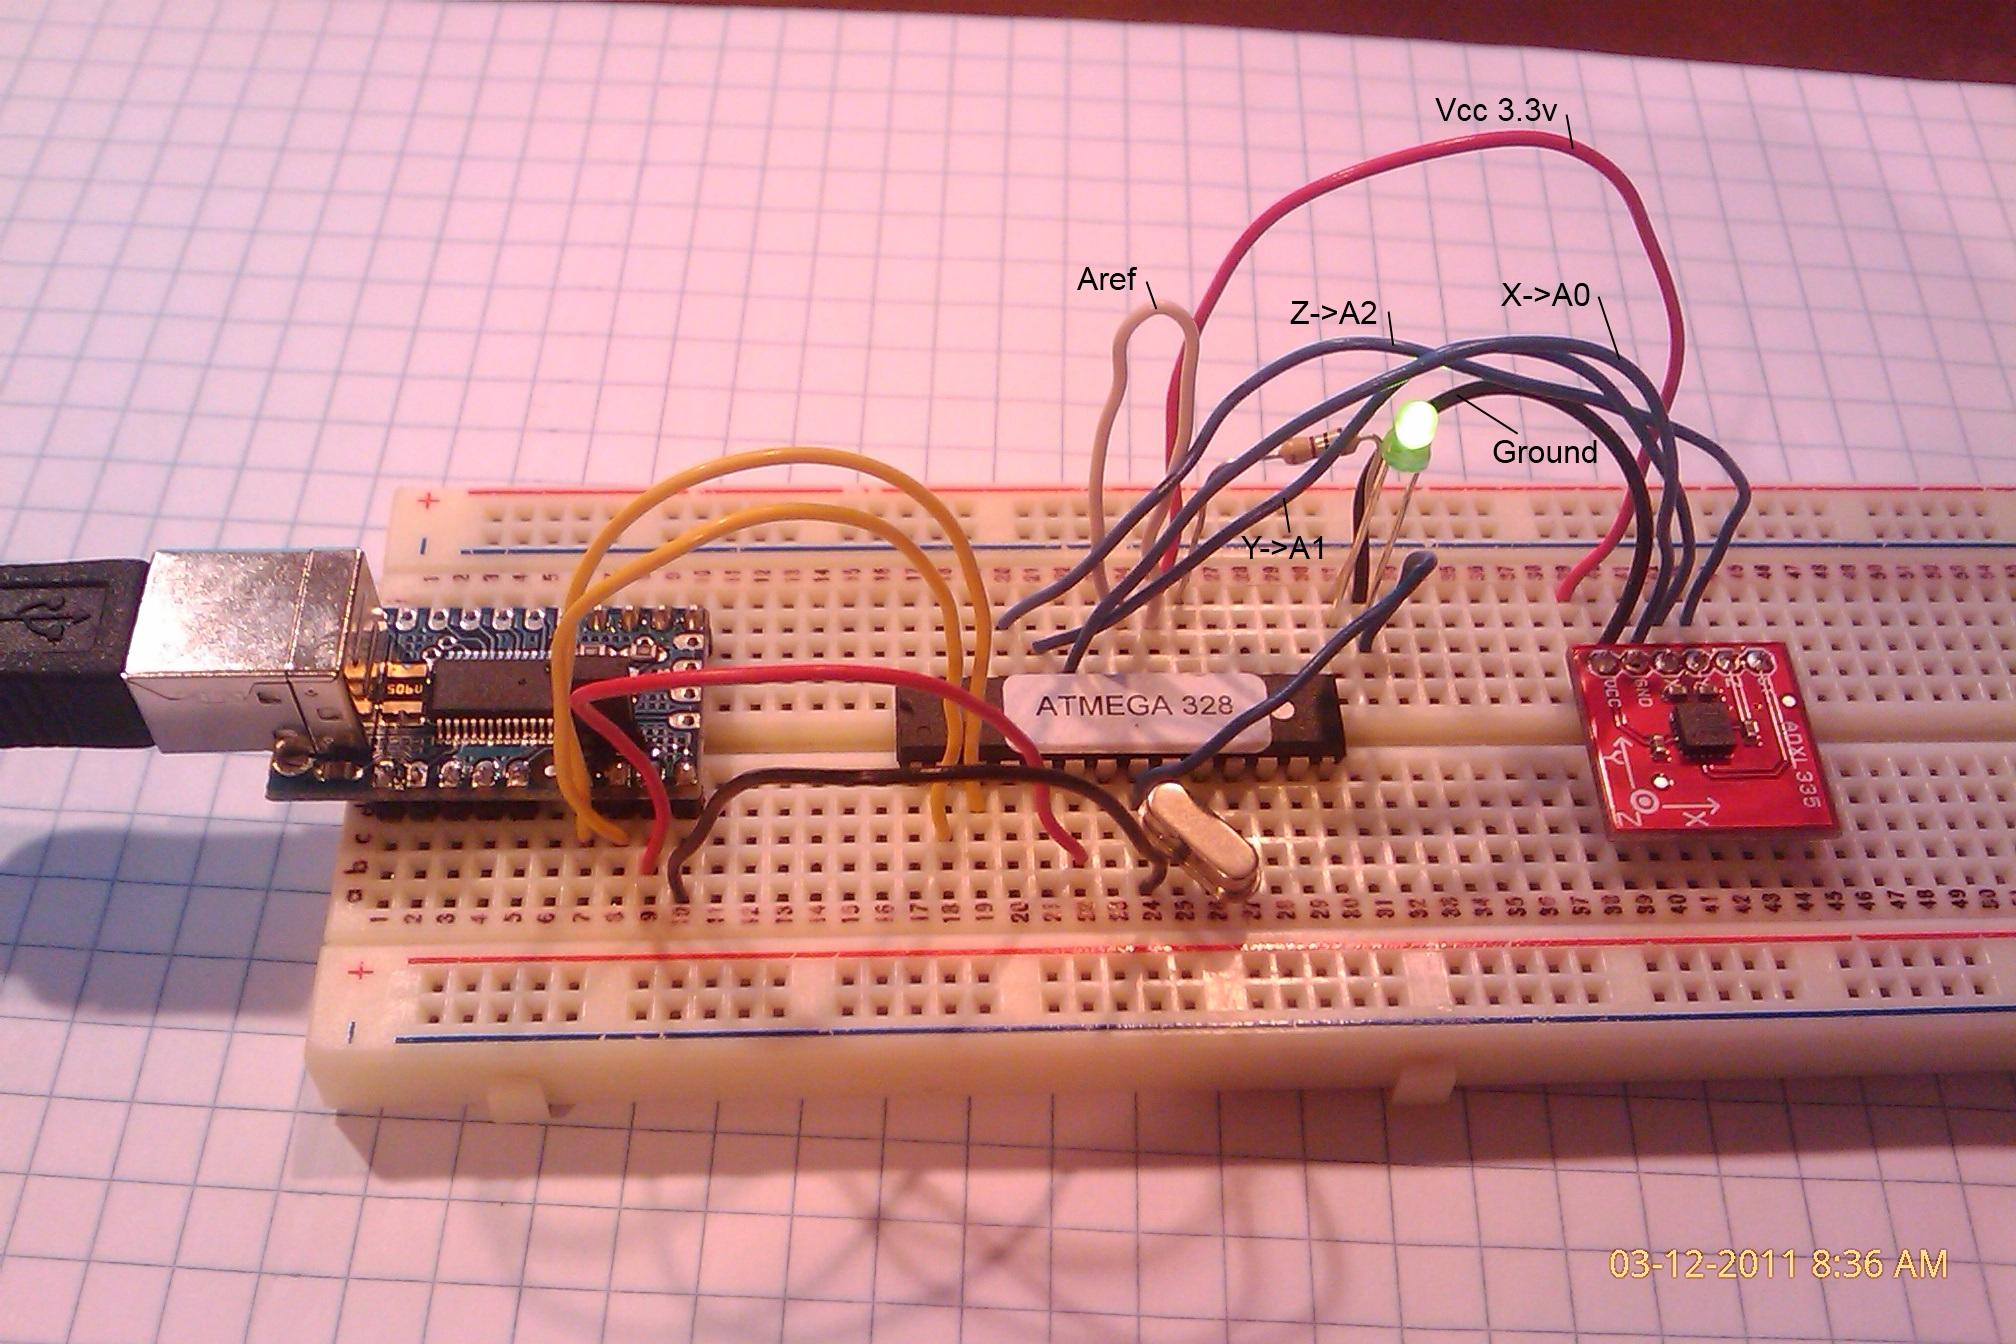 Triple axis accelerometer and custom Arduino board